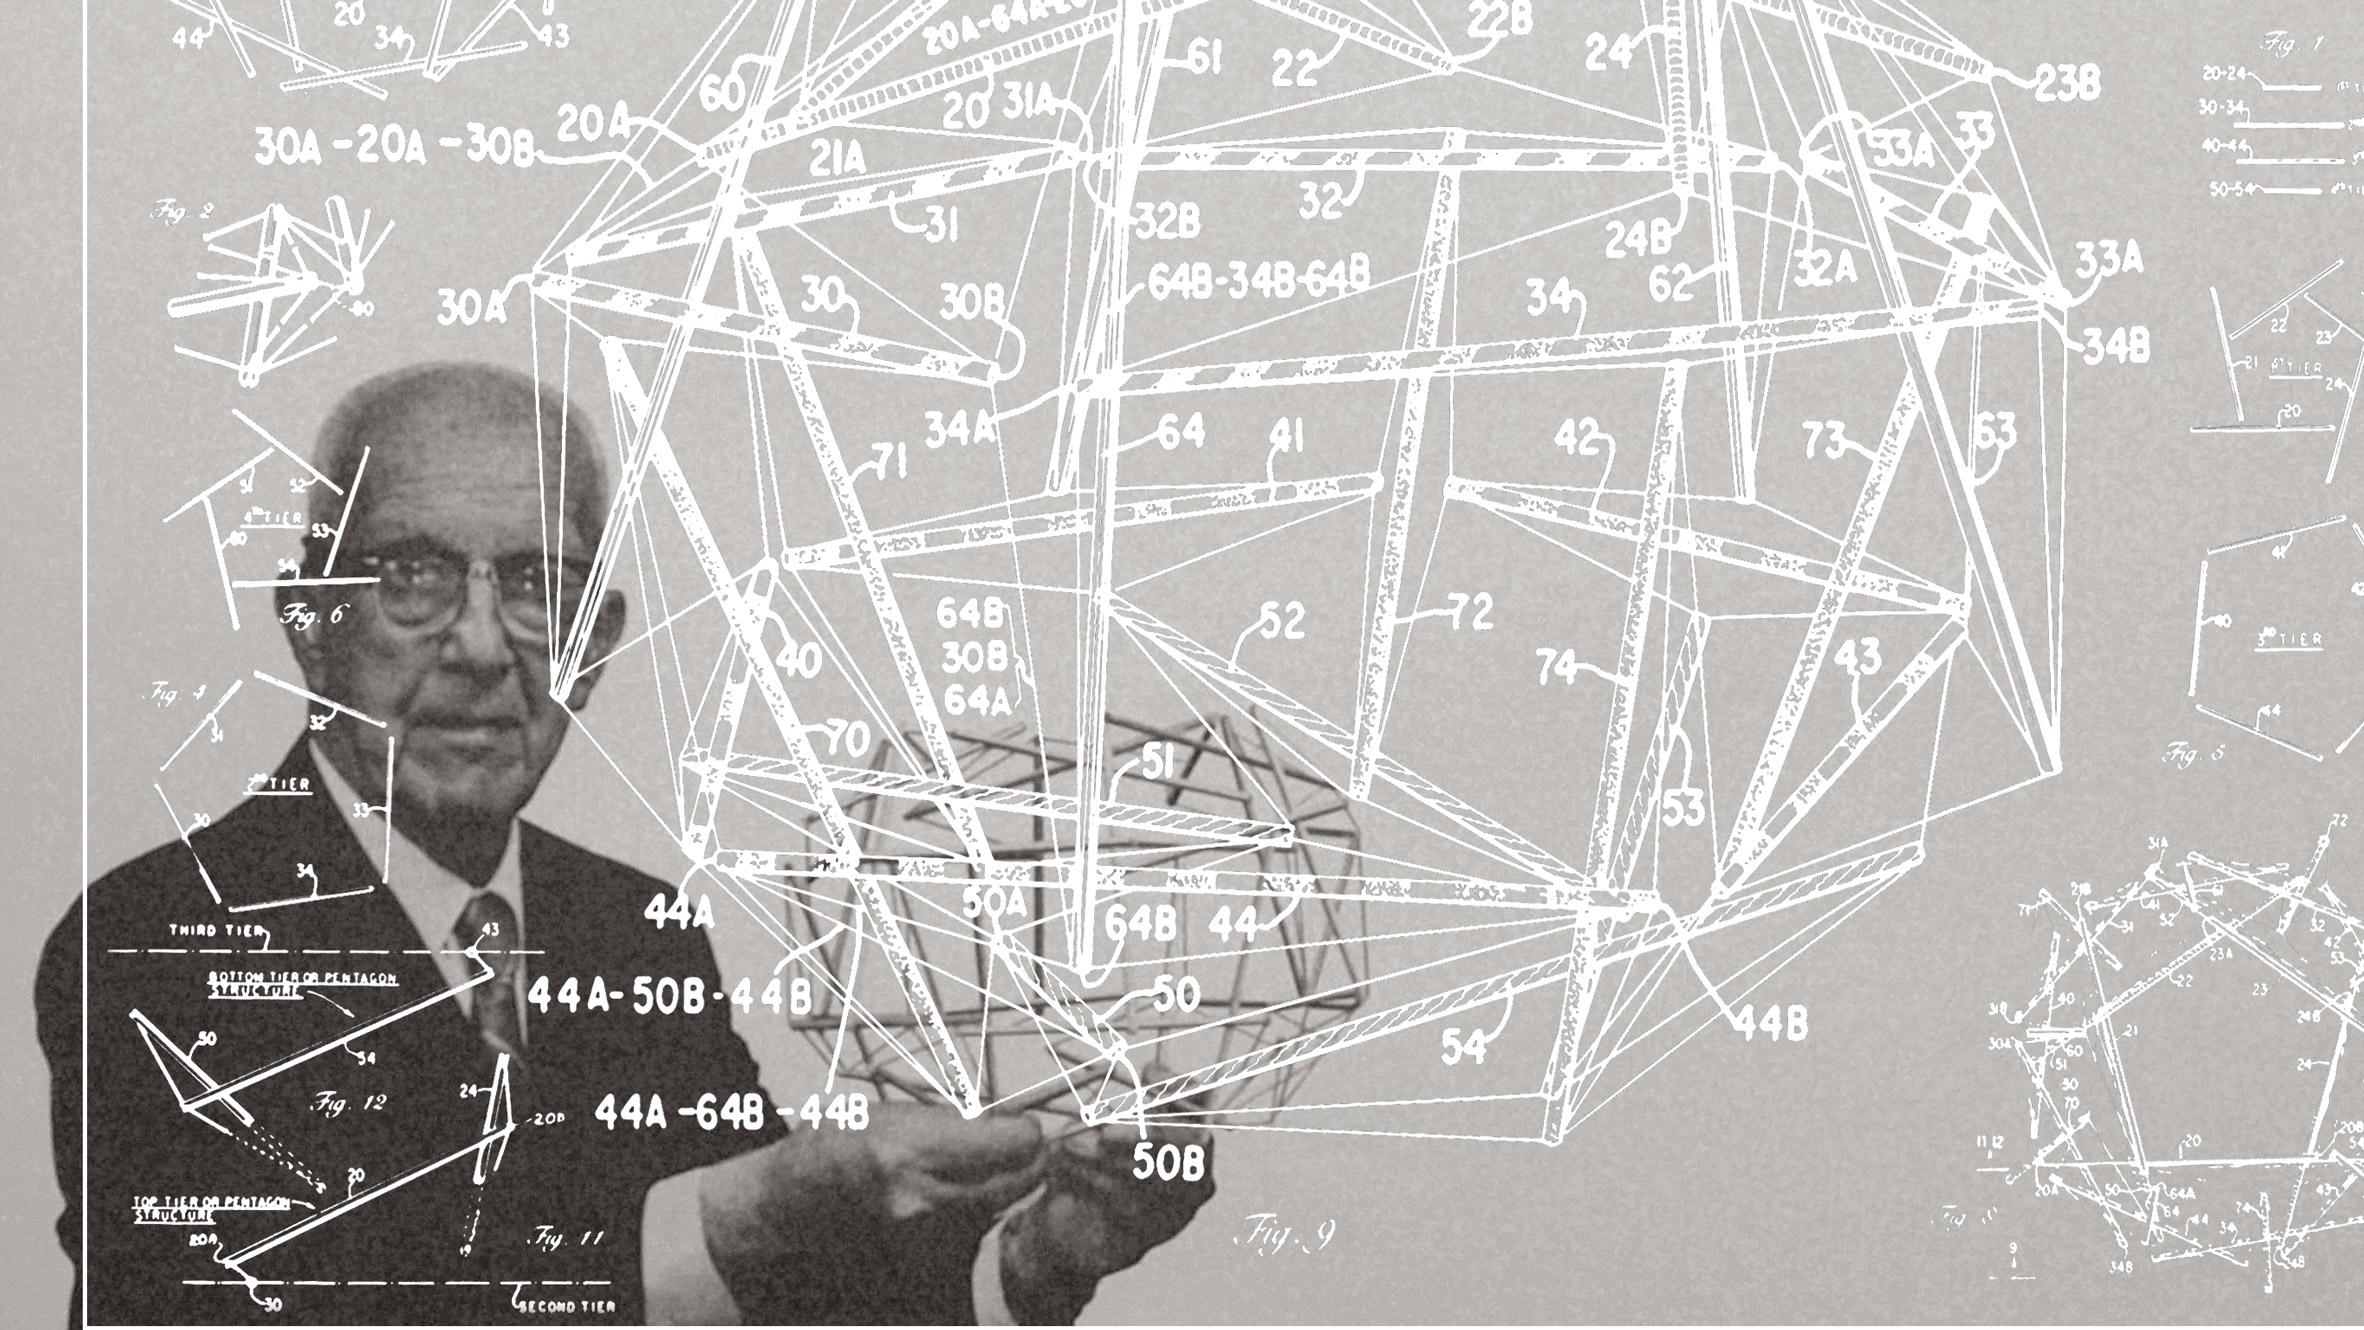 richard-buckminster-fuller-inventions-and-models-edward-cella-art-architecture-los-angeles-gallery_dezeen_hero.jpg